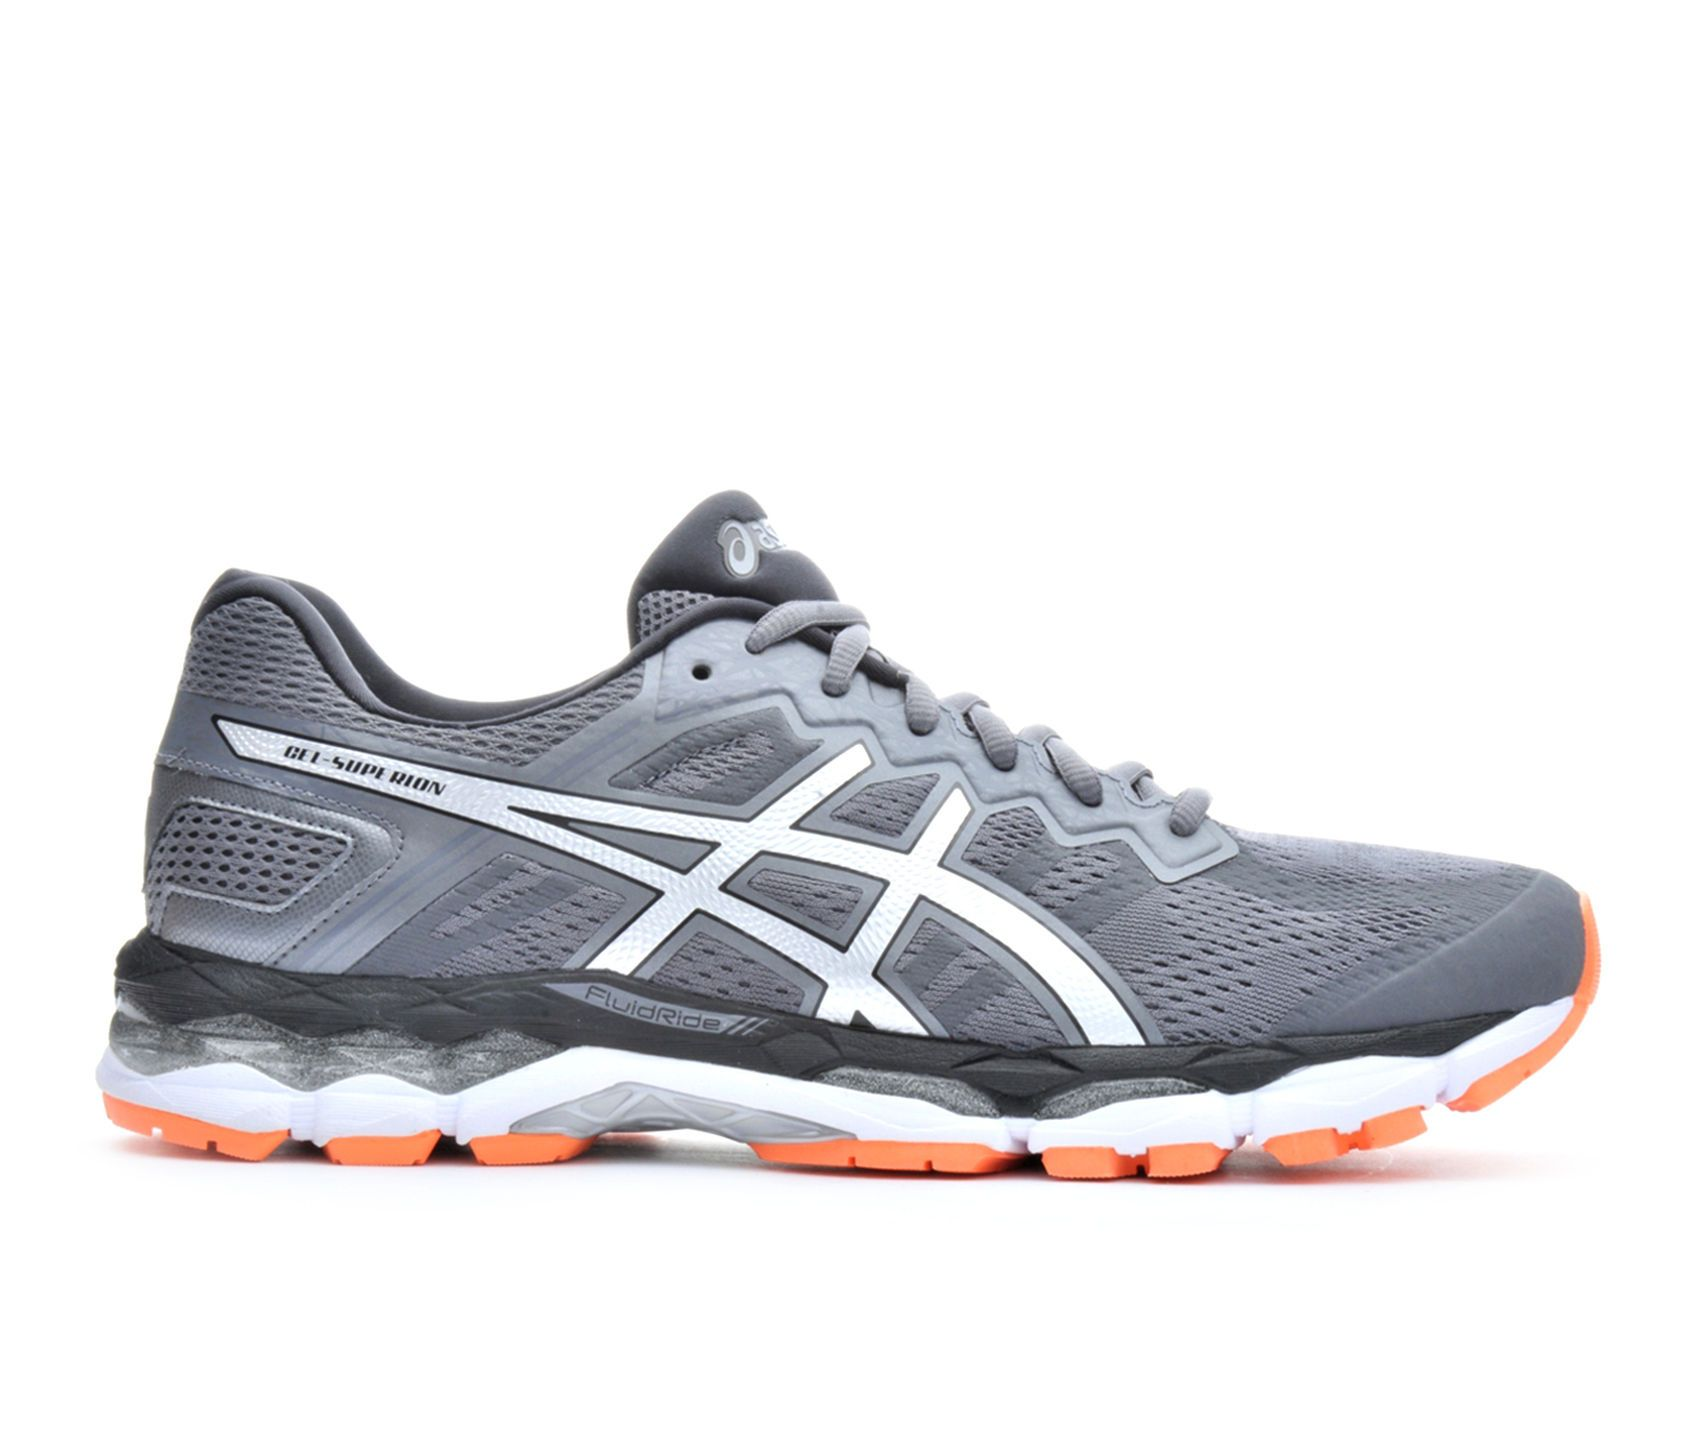 Men's Asics Gel Superion Running Shoes